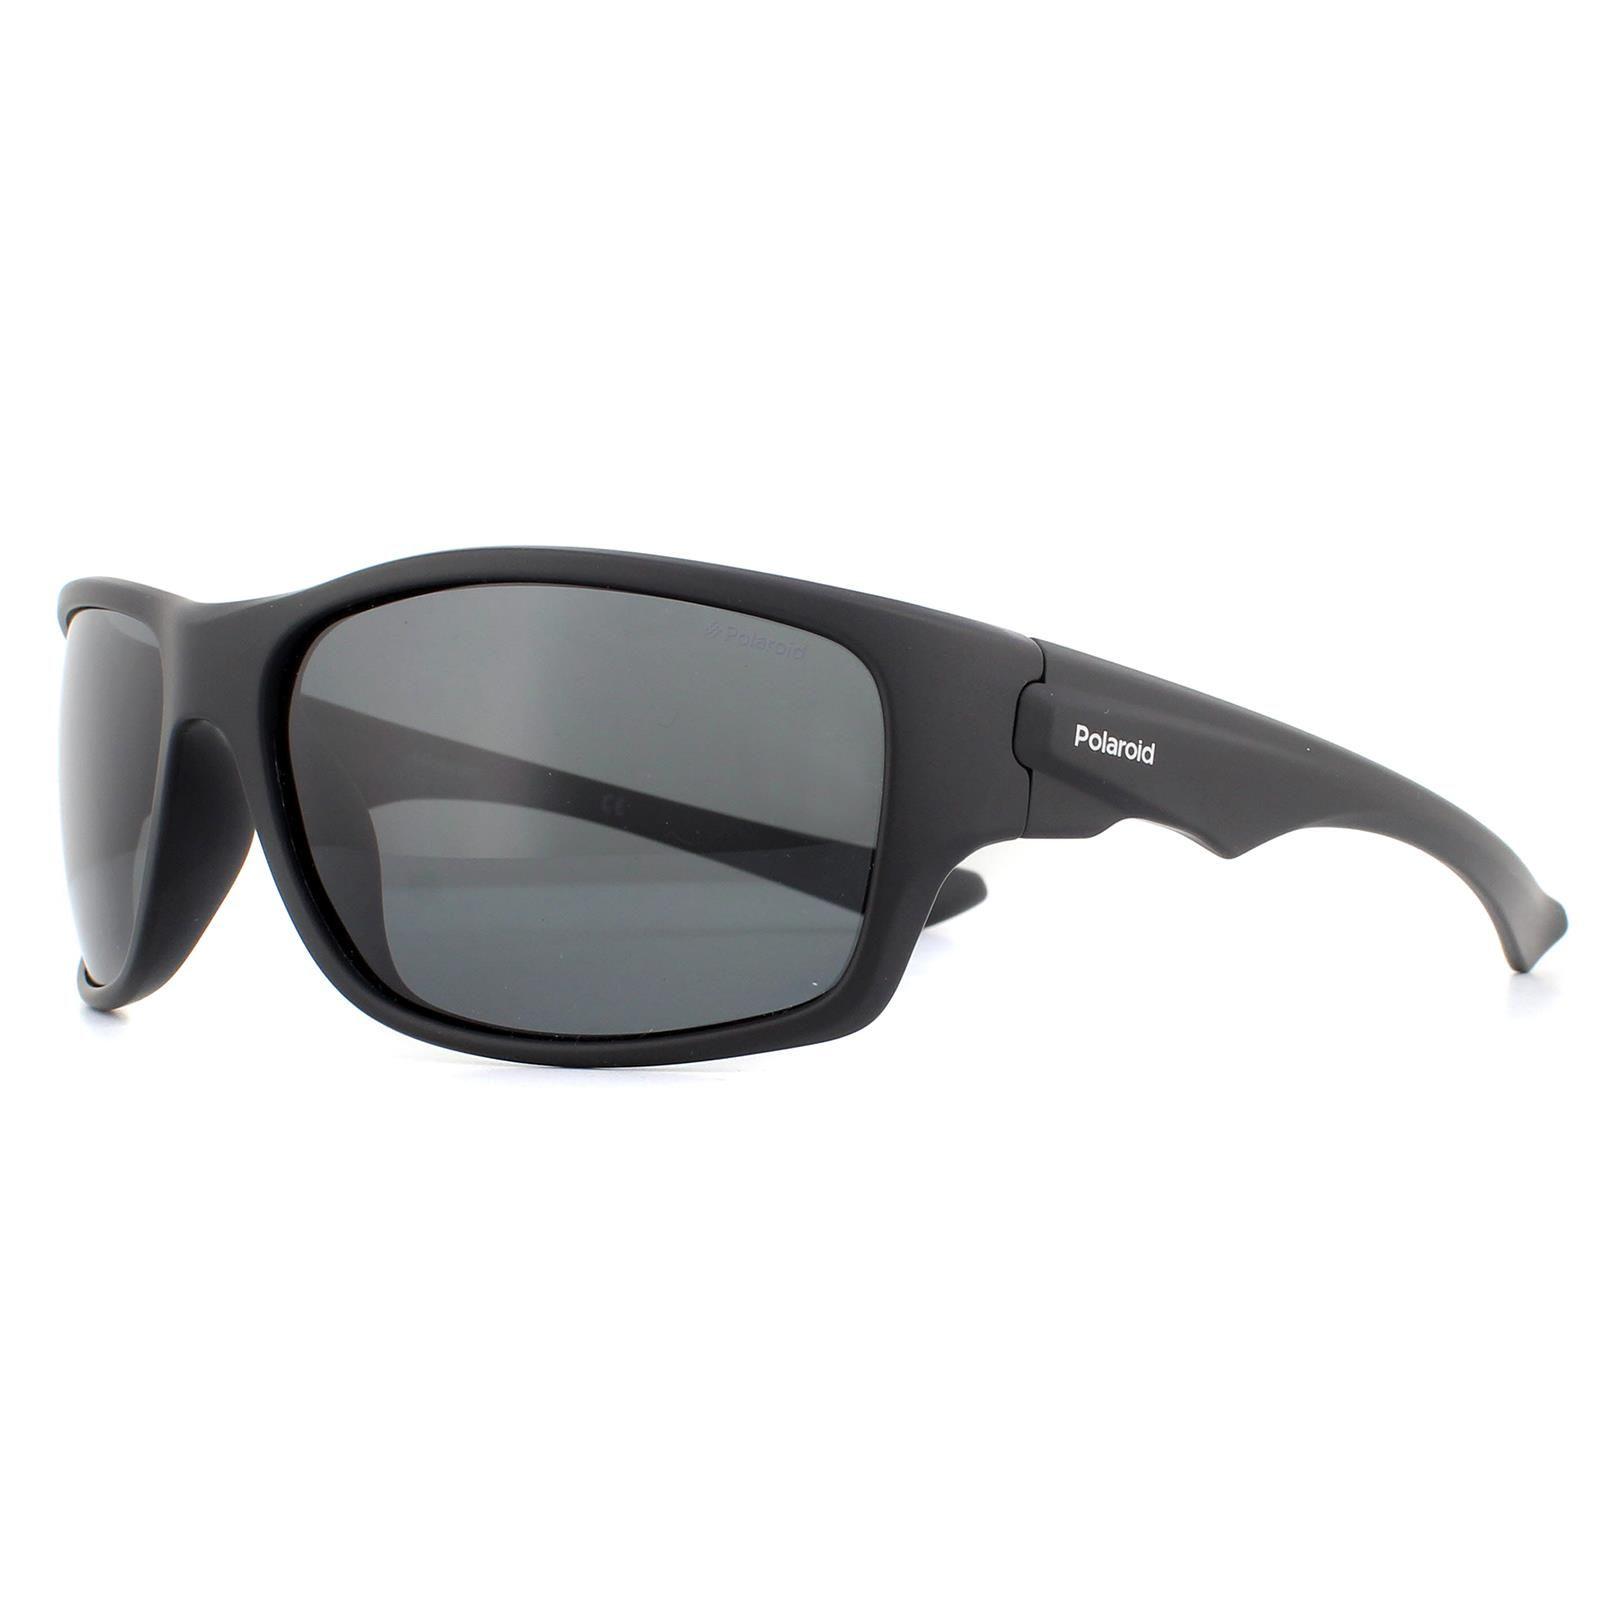 Polaroid Sunglasses PLD 7012/S 807 M9 Black Grey Polarized